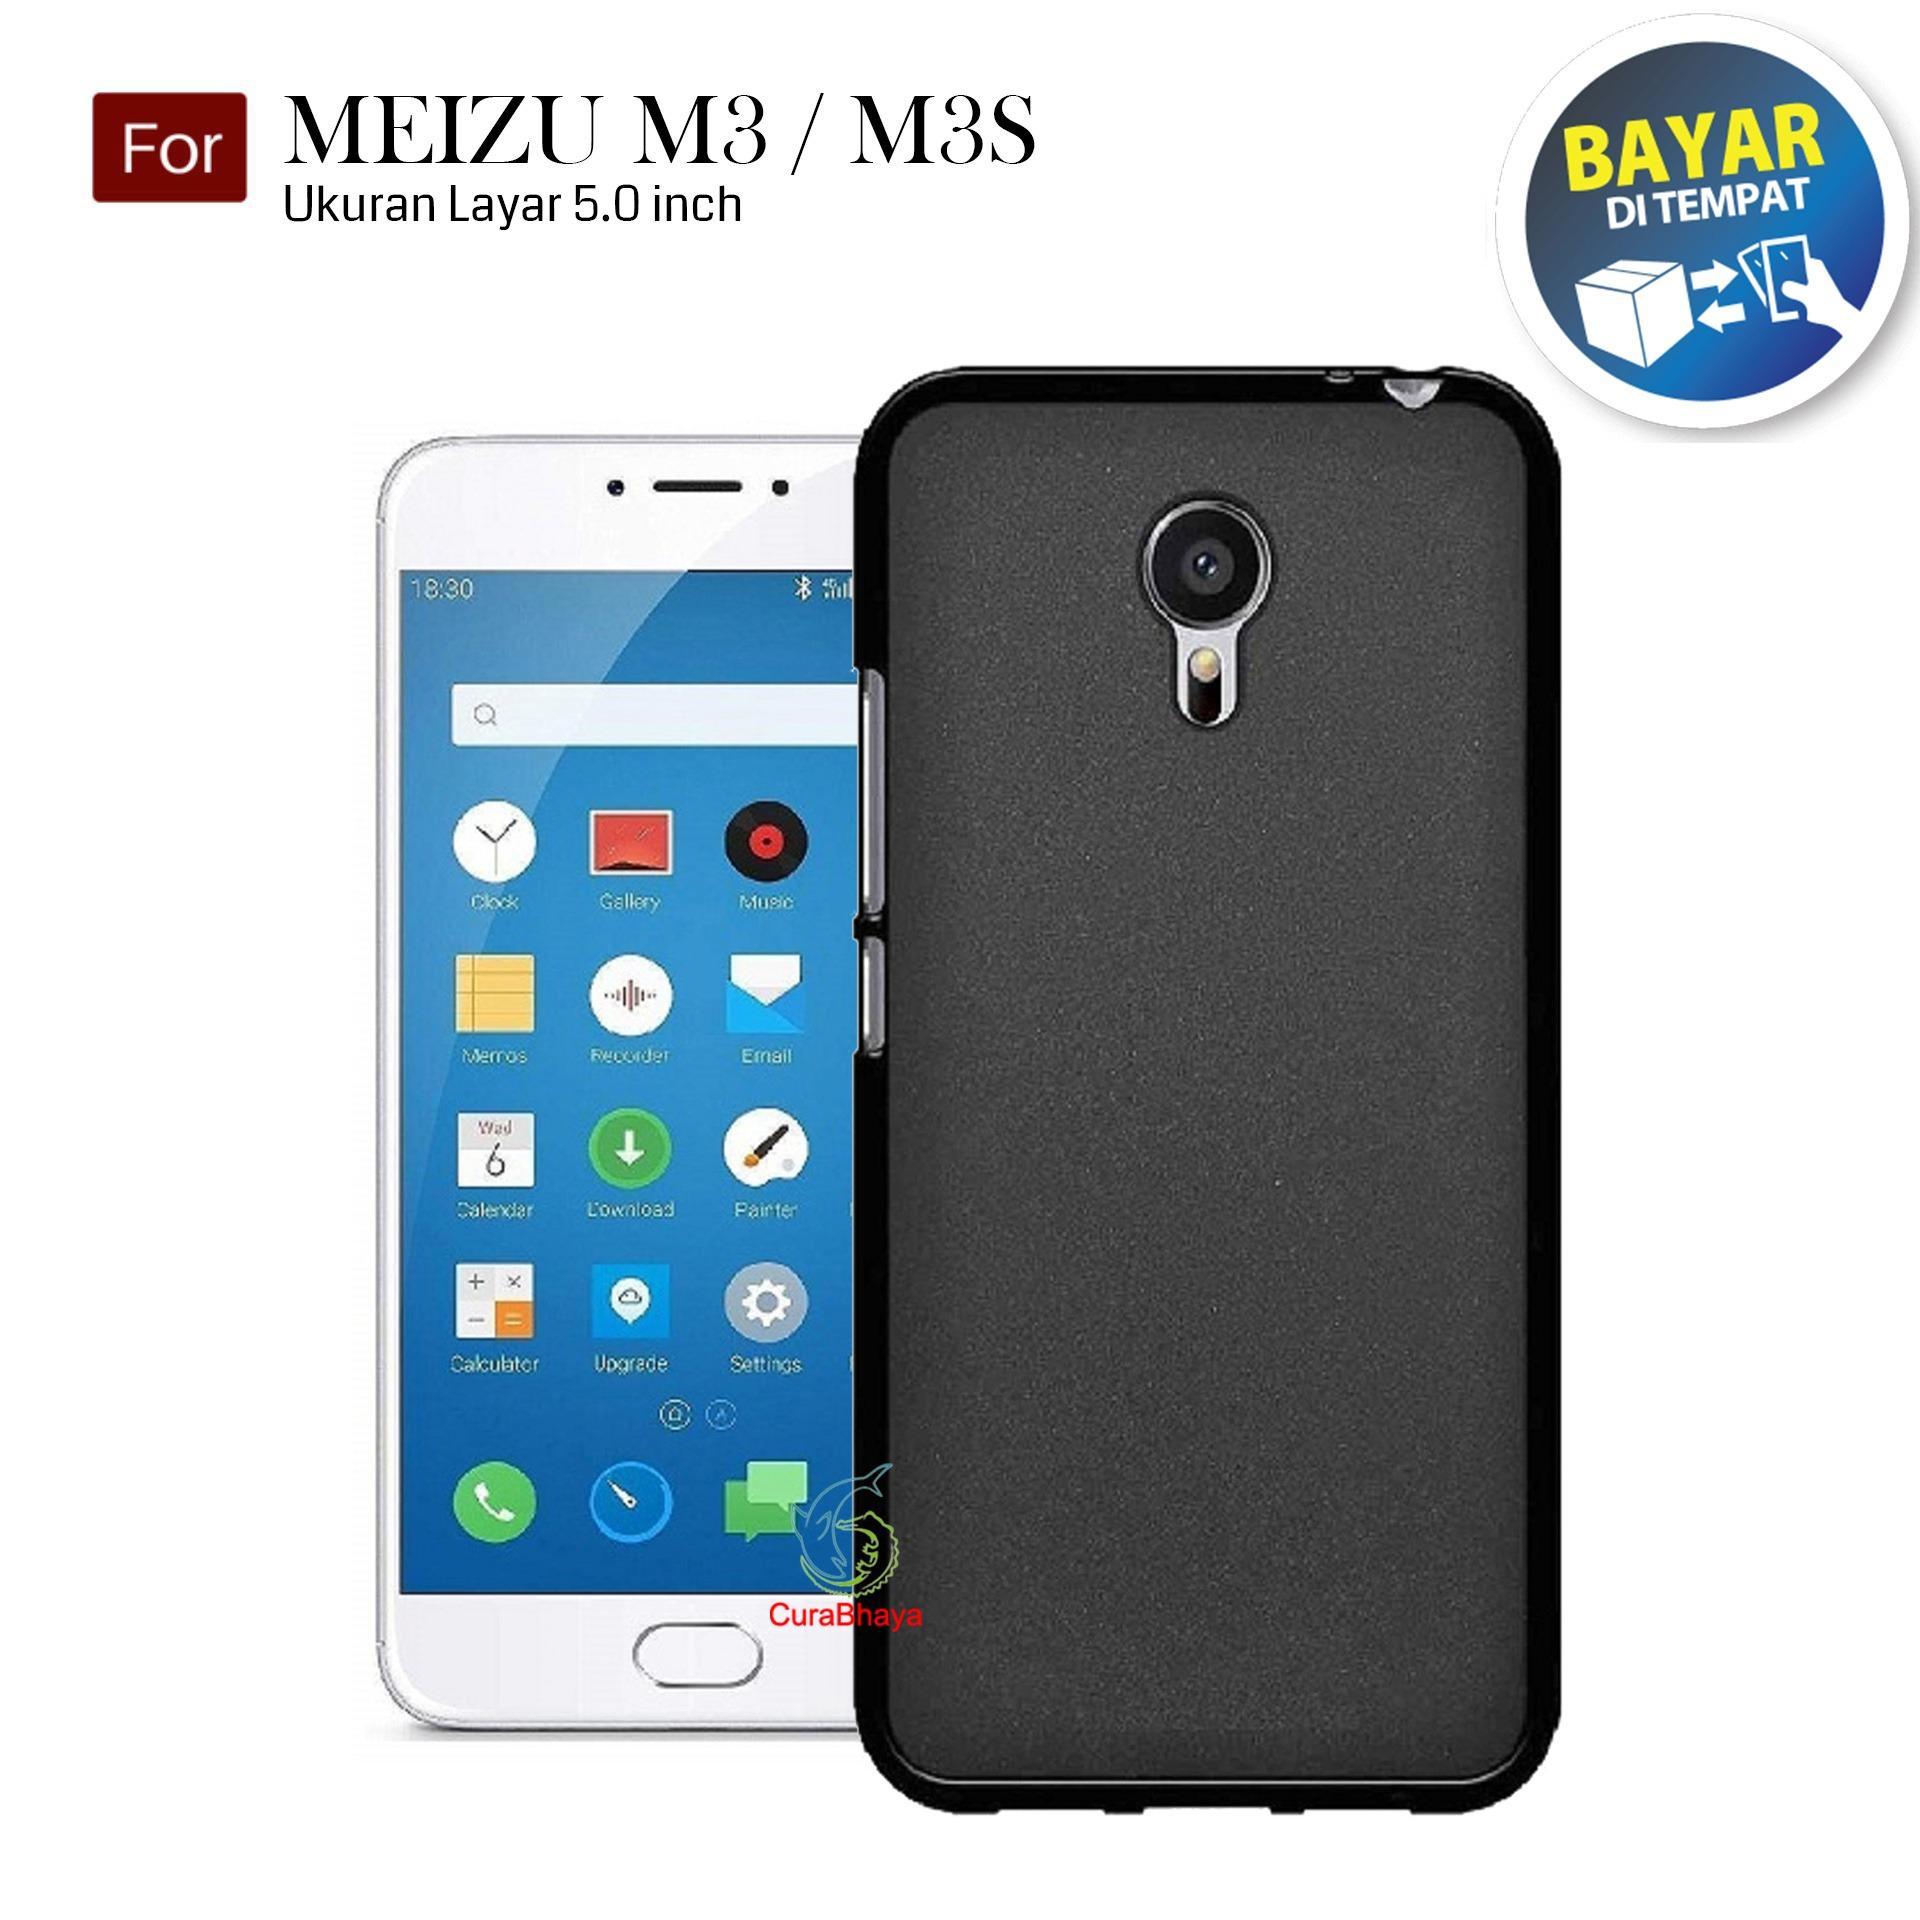 MidNight Meizu M3 / M3s / Mini | Slim Case Black Matte Softcase Premium Baby Skin